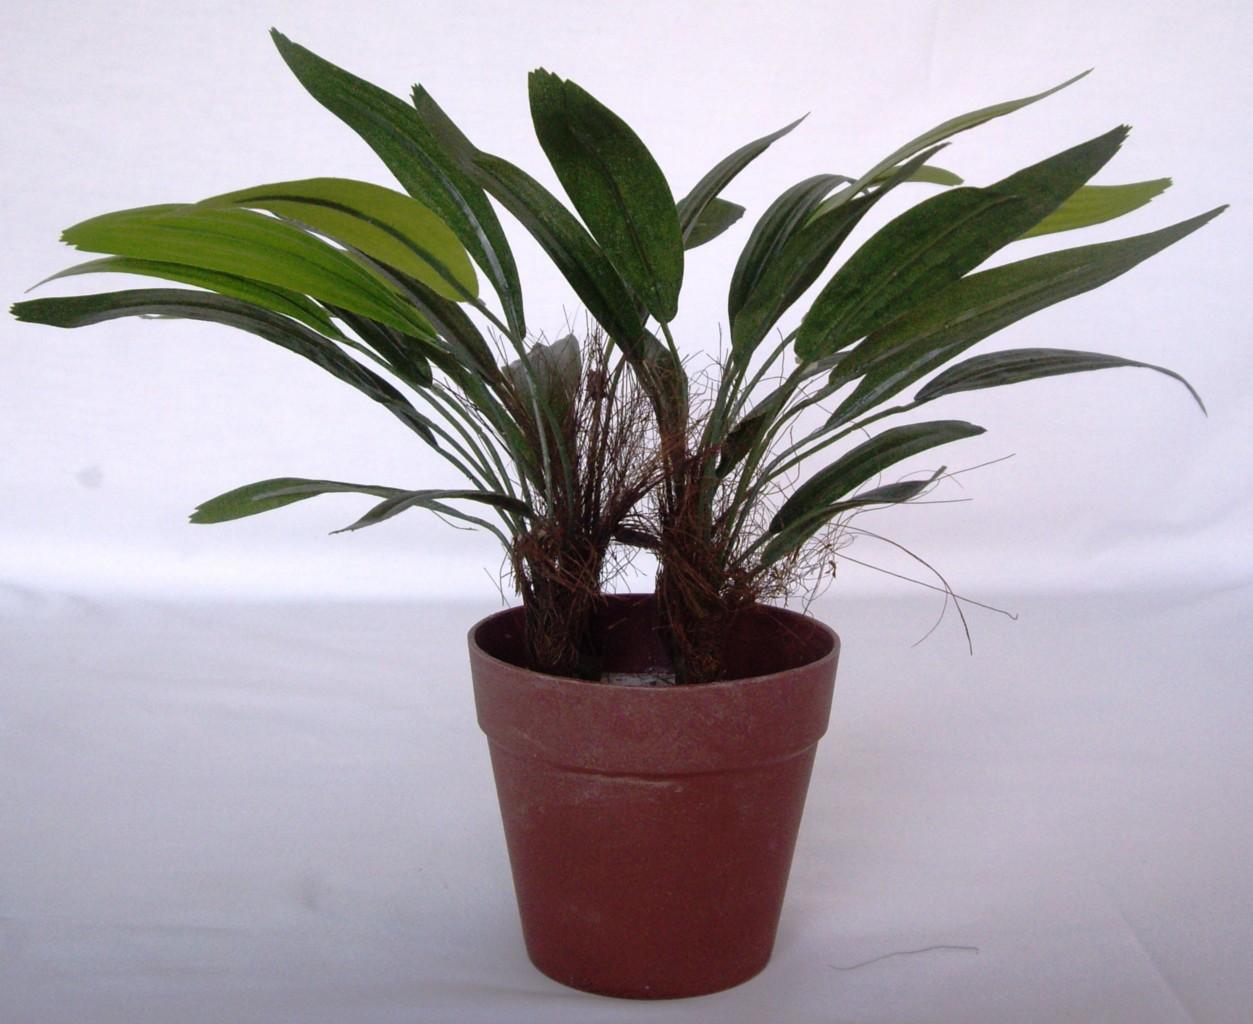 3-Artificial-Plants-Flower-Tree-Mini-Rhapis-In-Pots-Pet-Dog-Cat-Safe-Water-Free